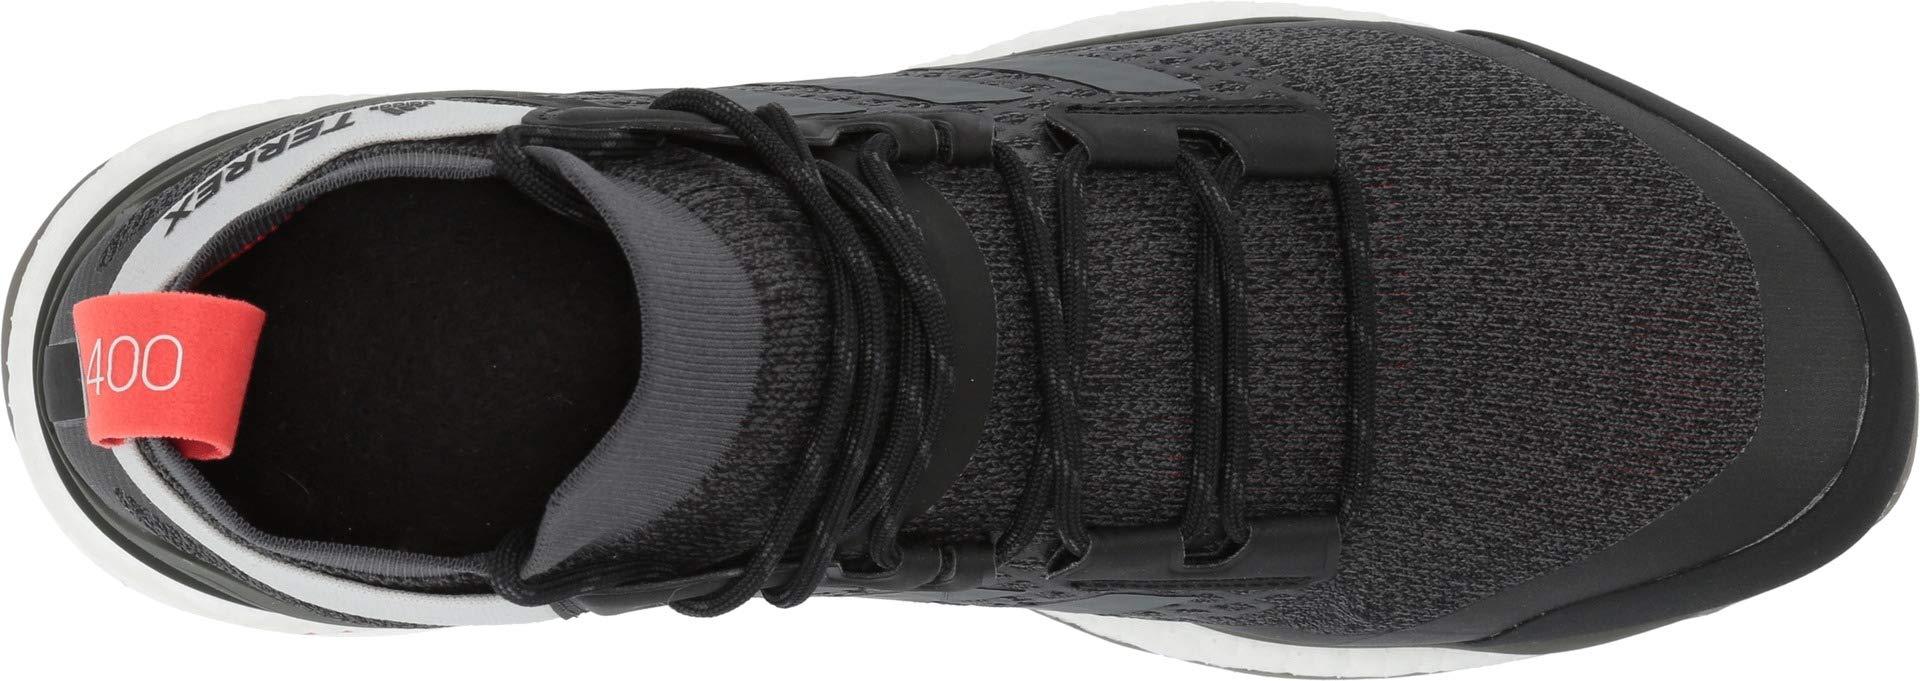 adidas outdoor Terrex Free Hiker Boot - Men's Black/Grey Six/Night Cargo, 7.5 by adidas outdoor (Image #2)